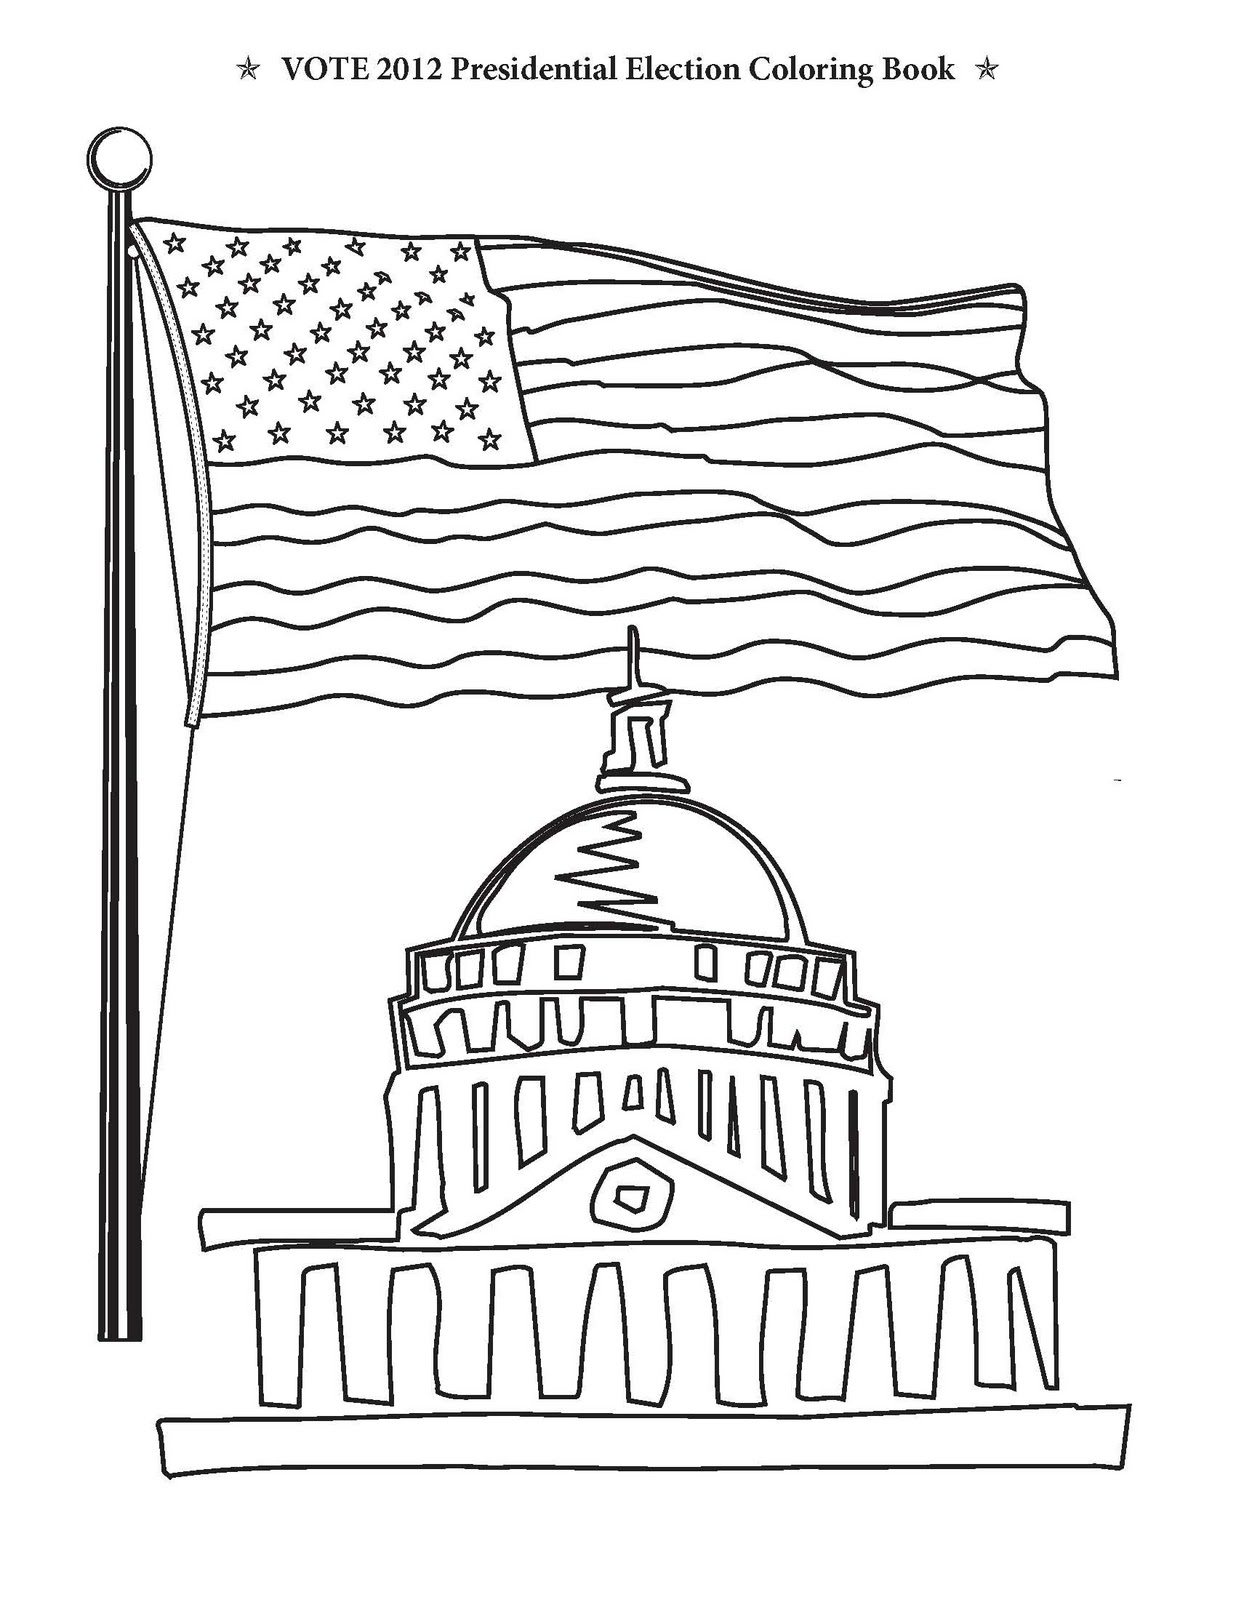 Vote 2012 Presidential Election Coloring Book November 2011